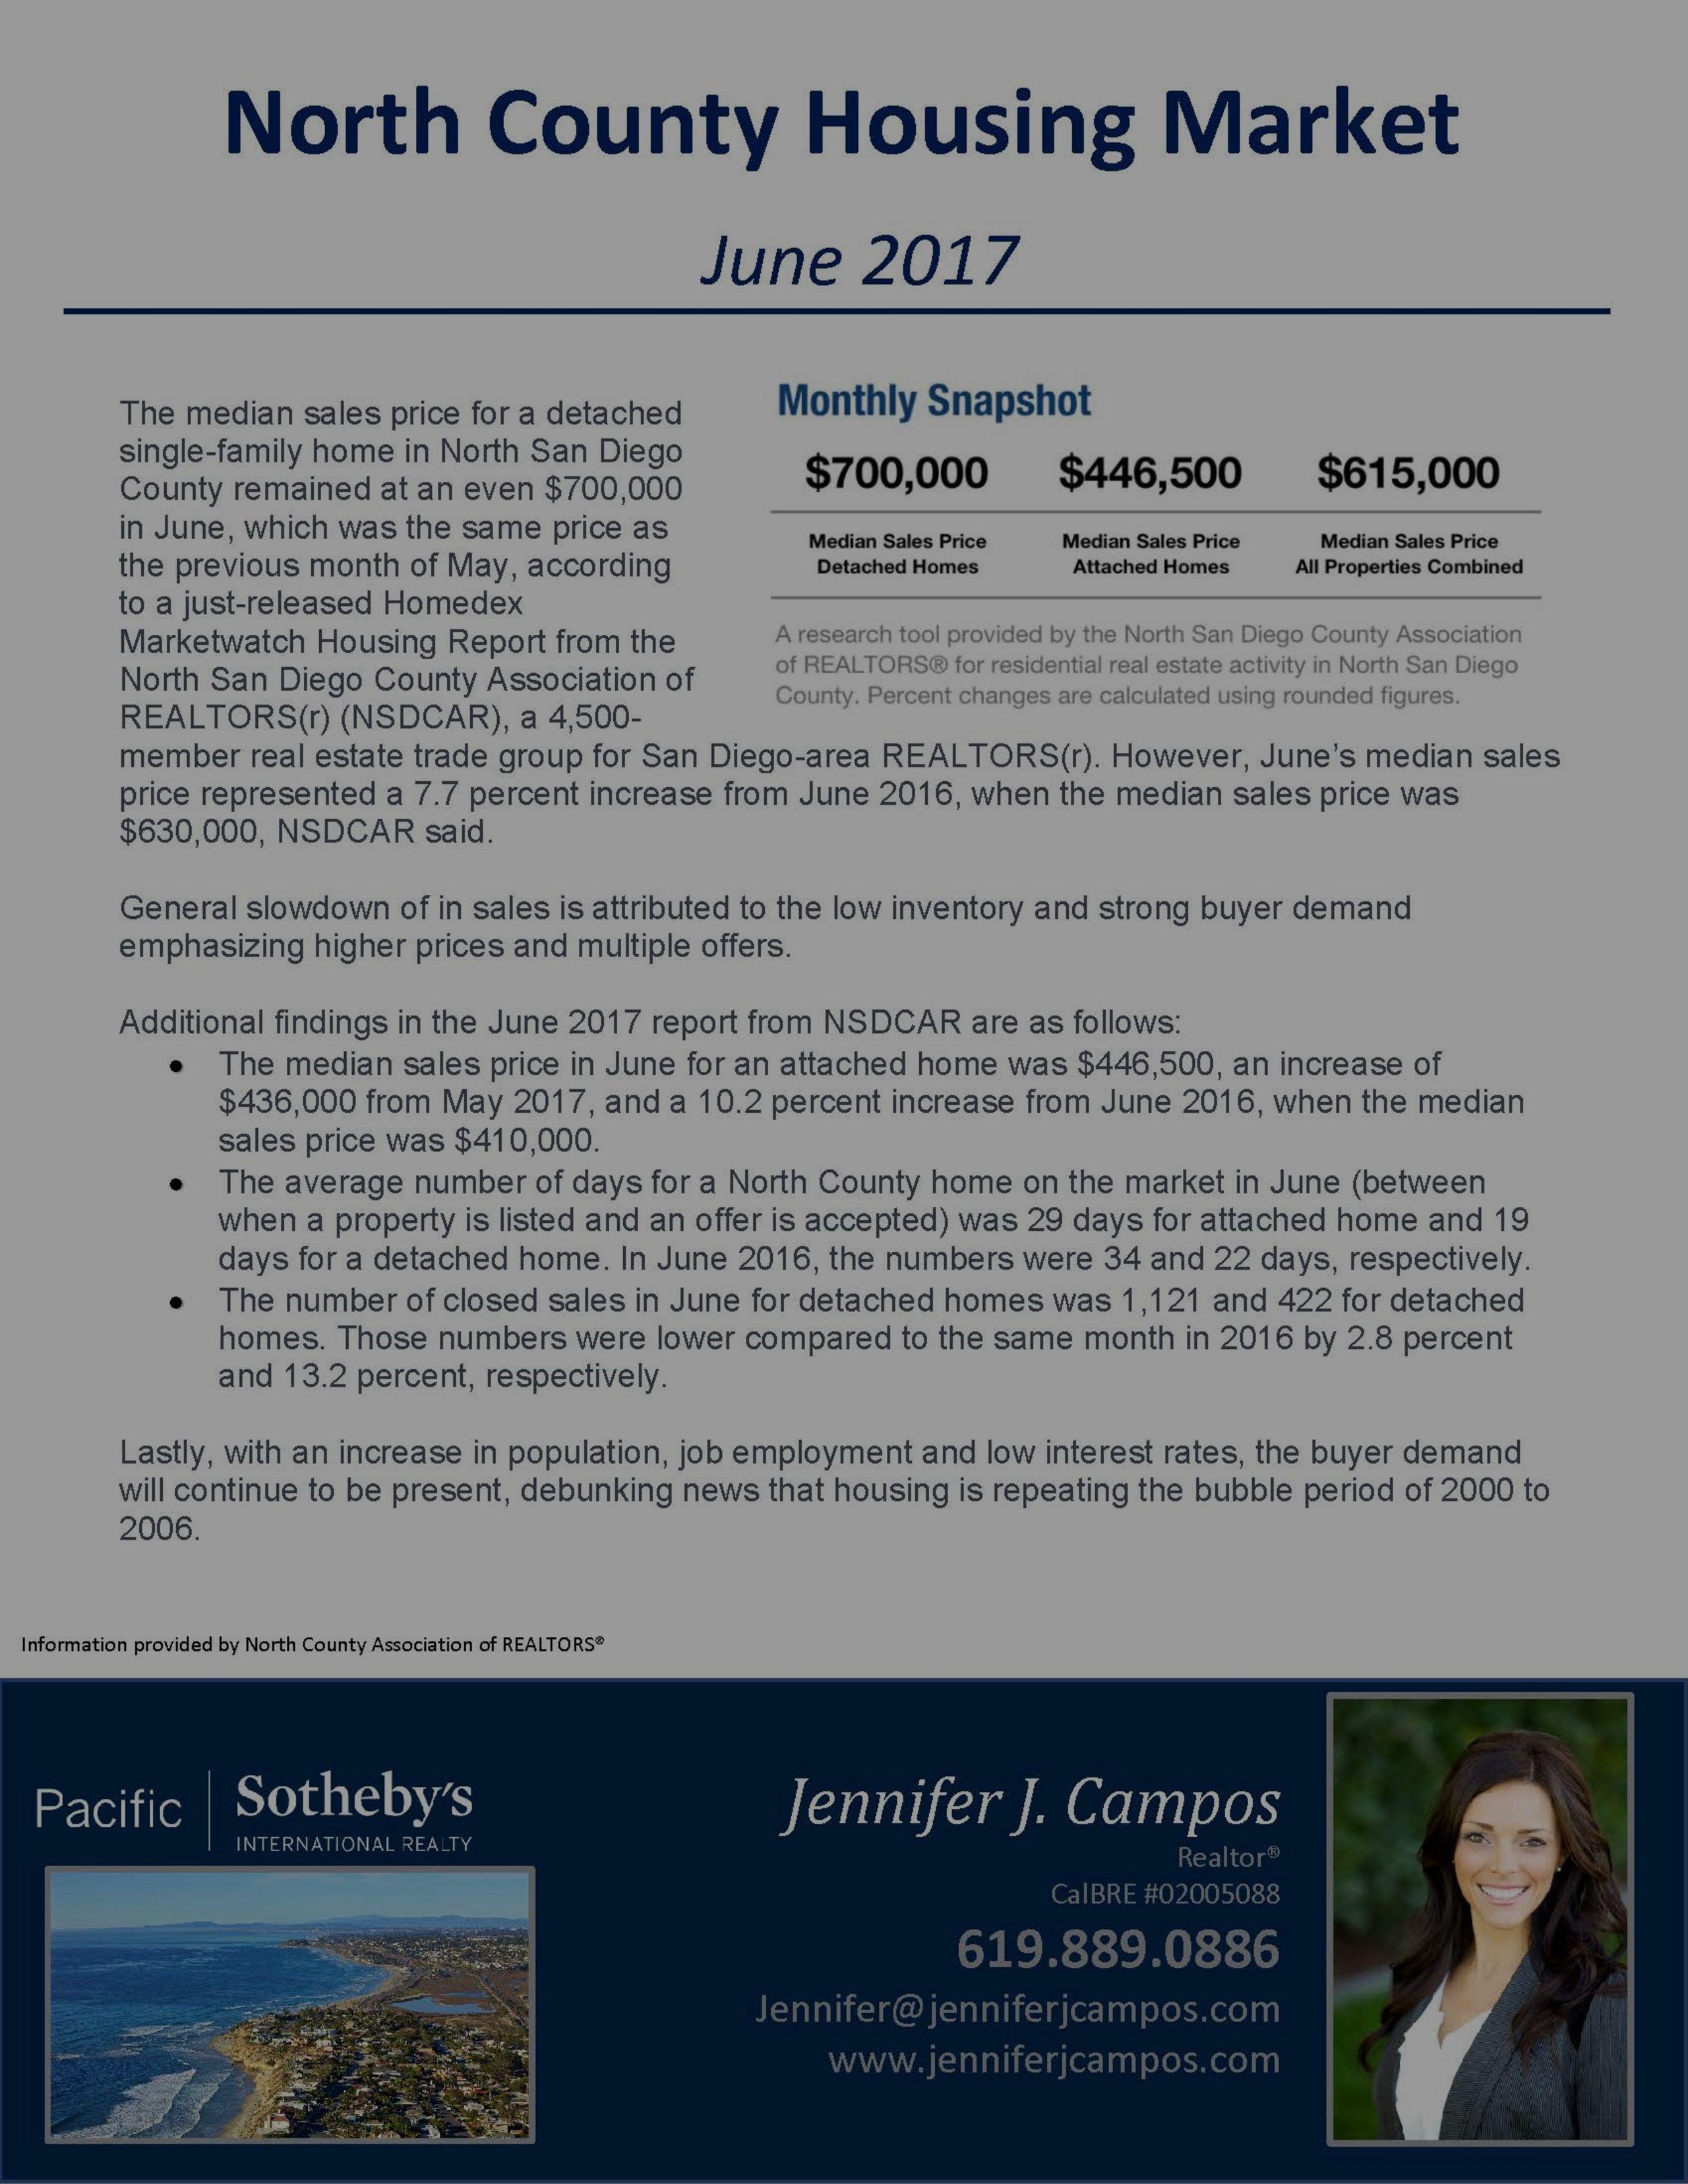 North County Housing Market Update